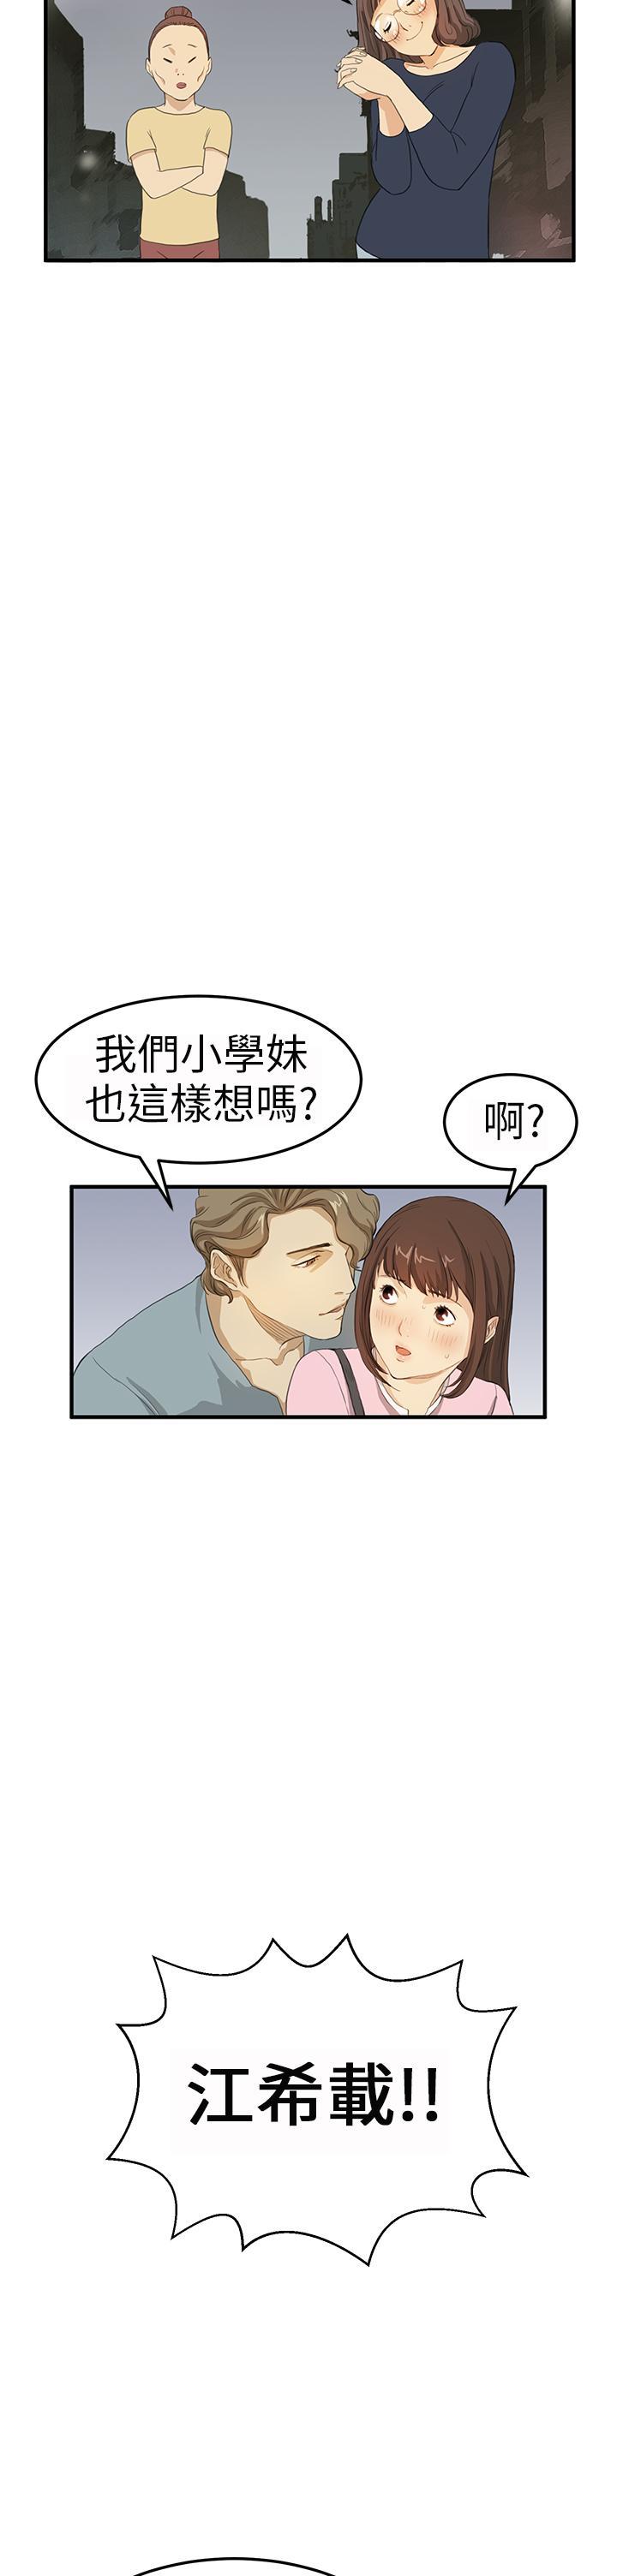 Si-Eun 诗恩 Ch.1~5 67